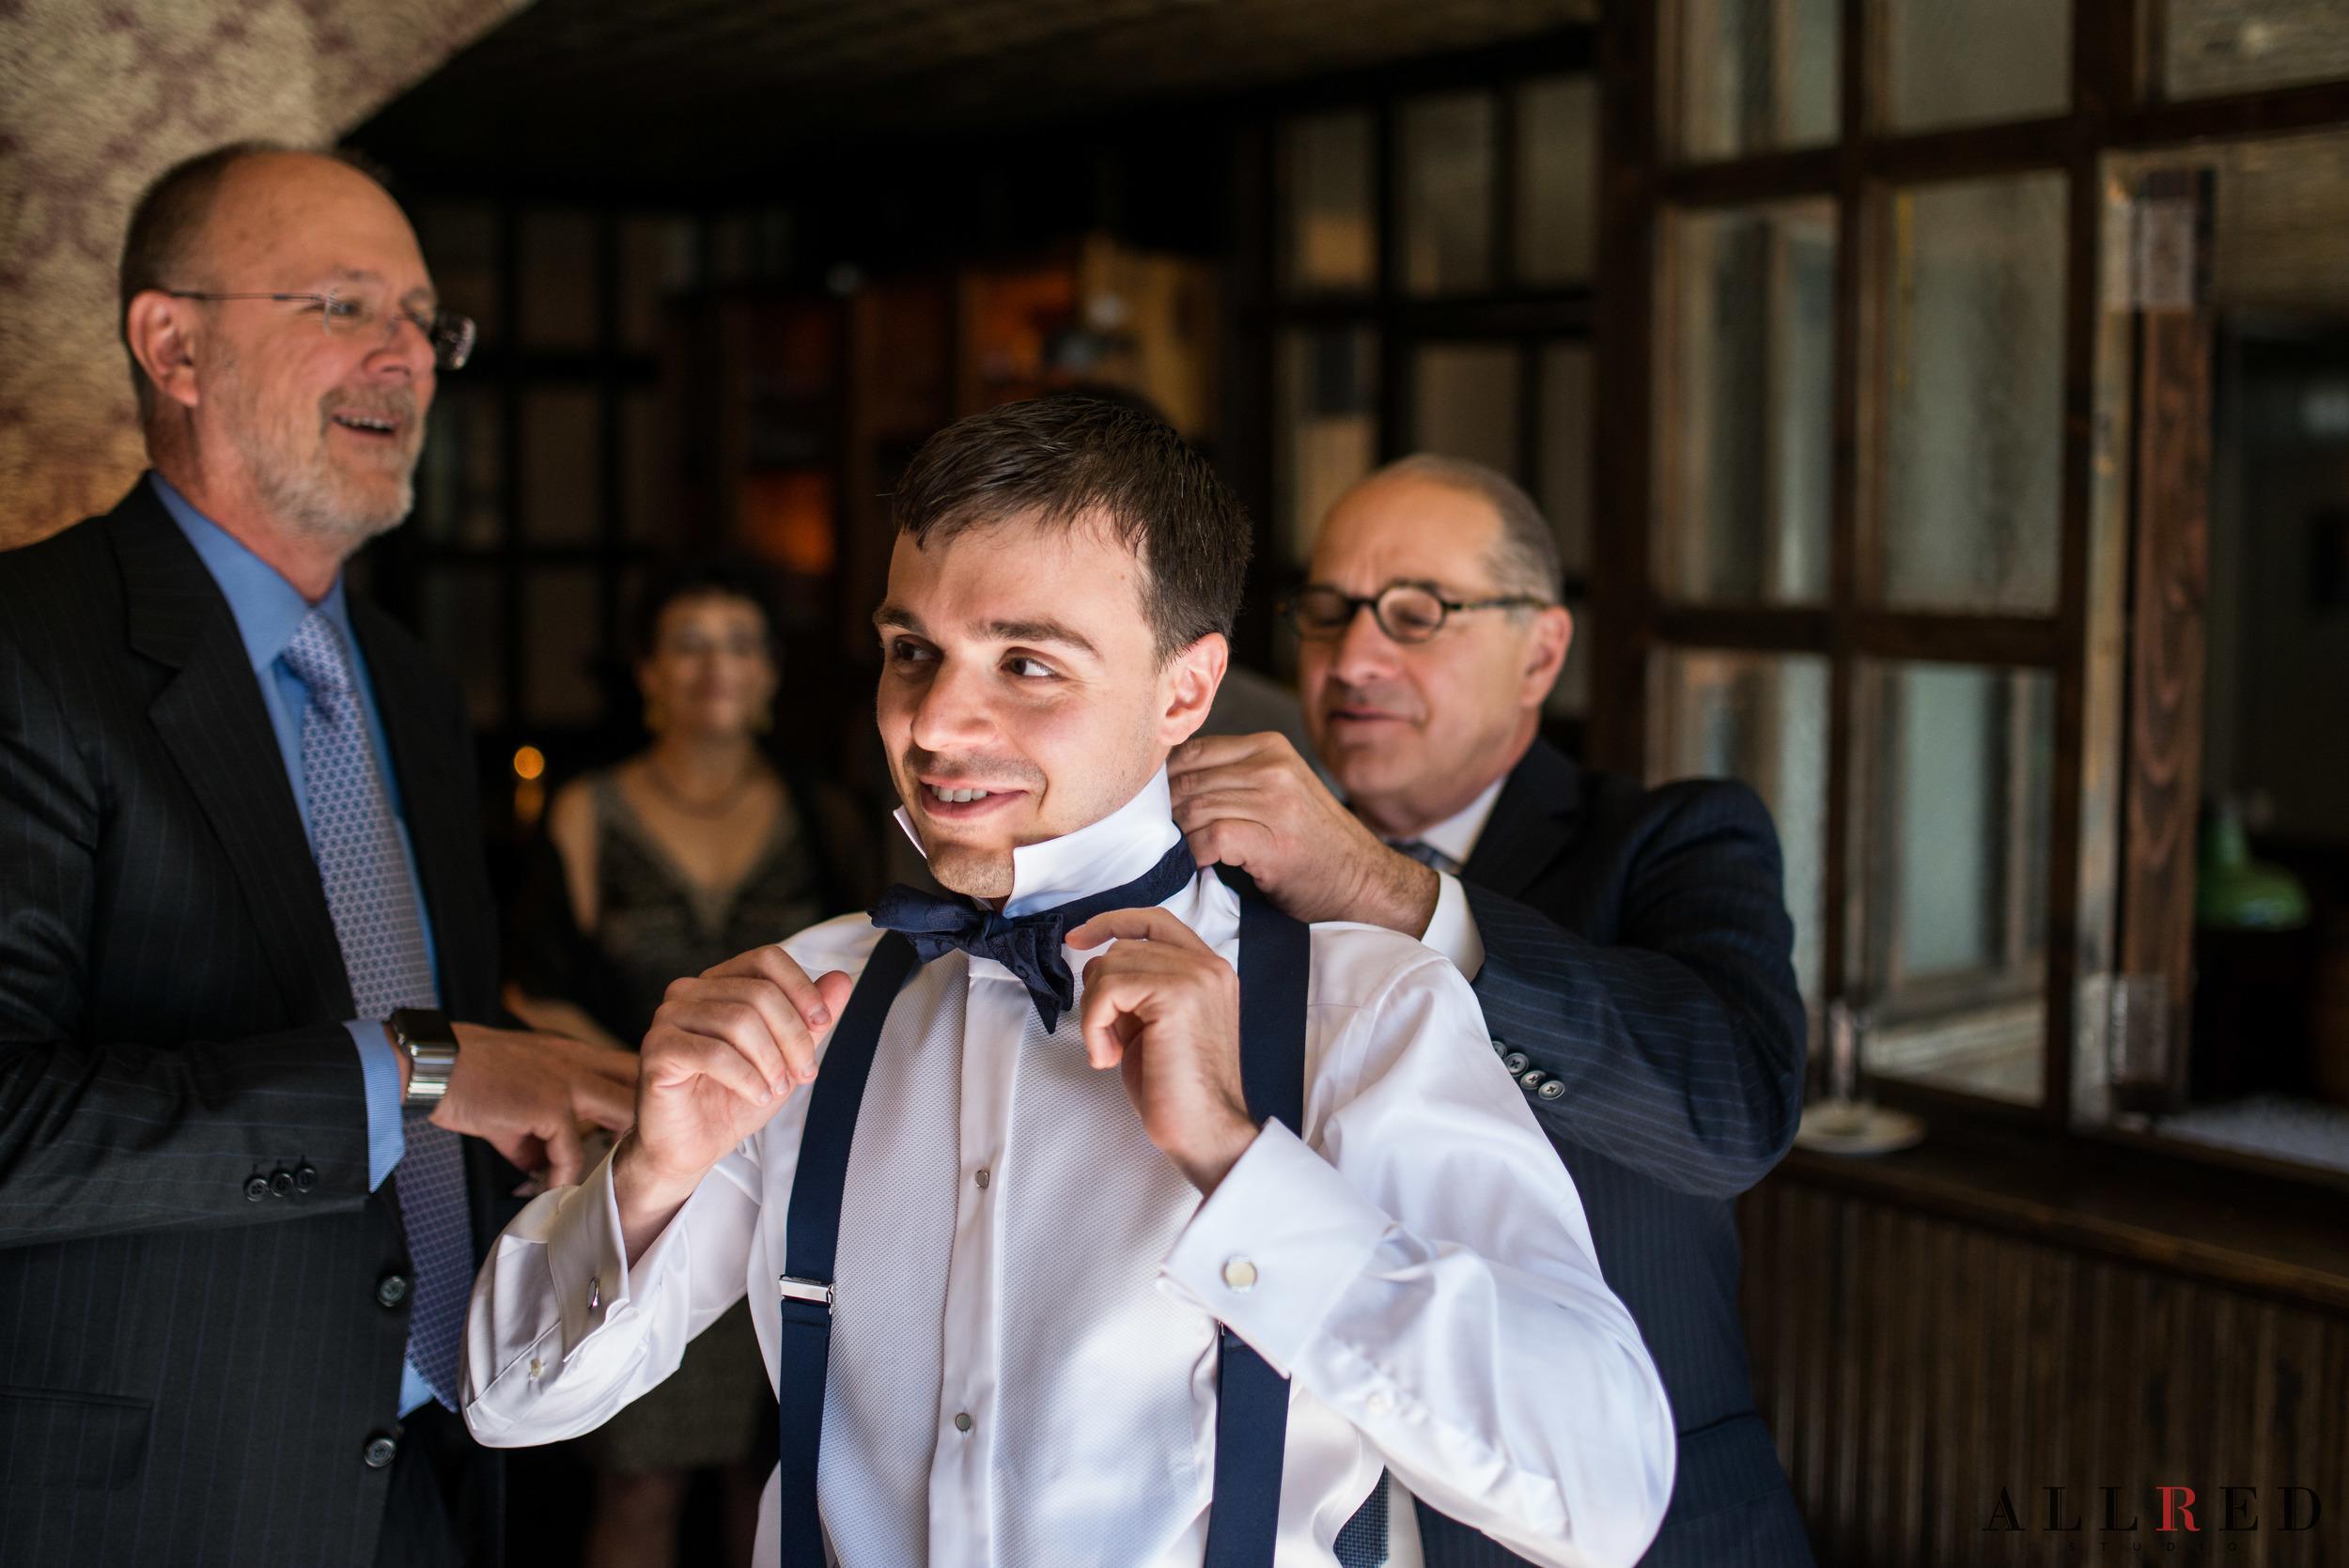 Wedding-Brooklyn-winery-allred-studio-new-york-photographer-new-jersey-hudson-valley-9568.jpg